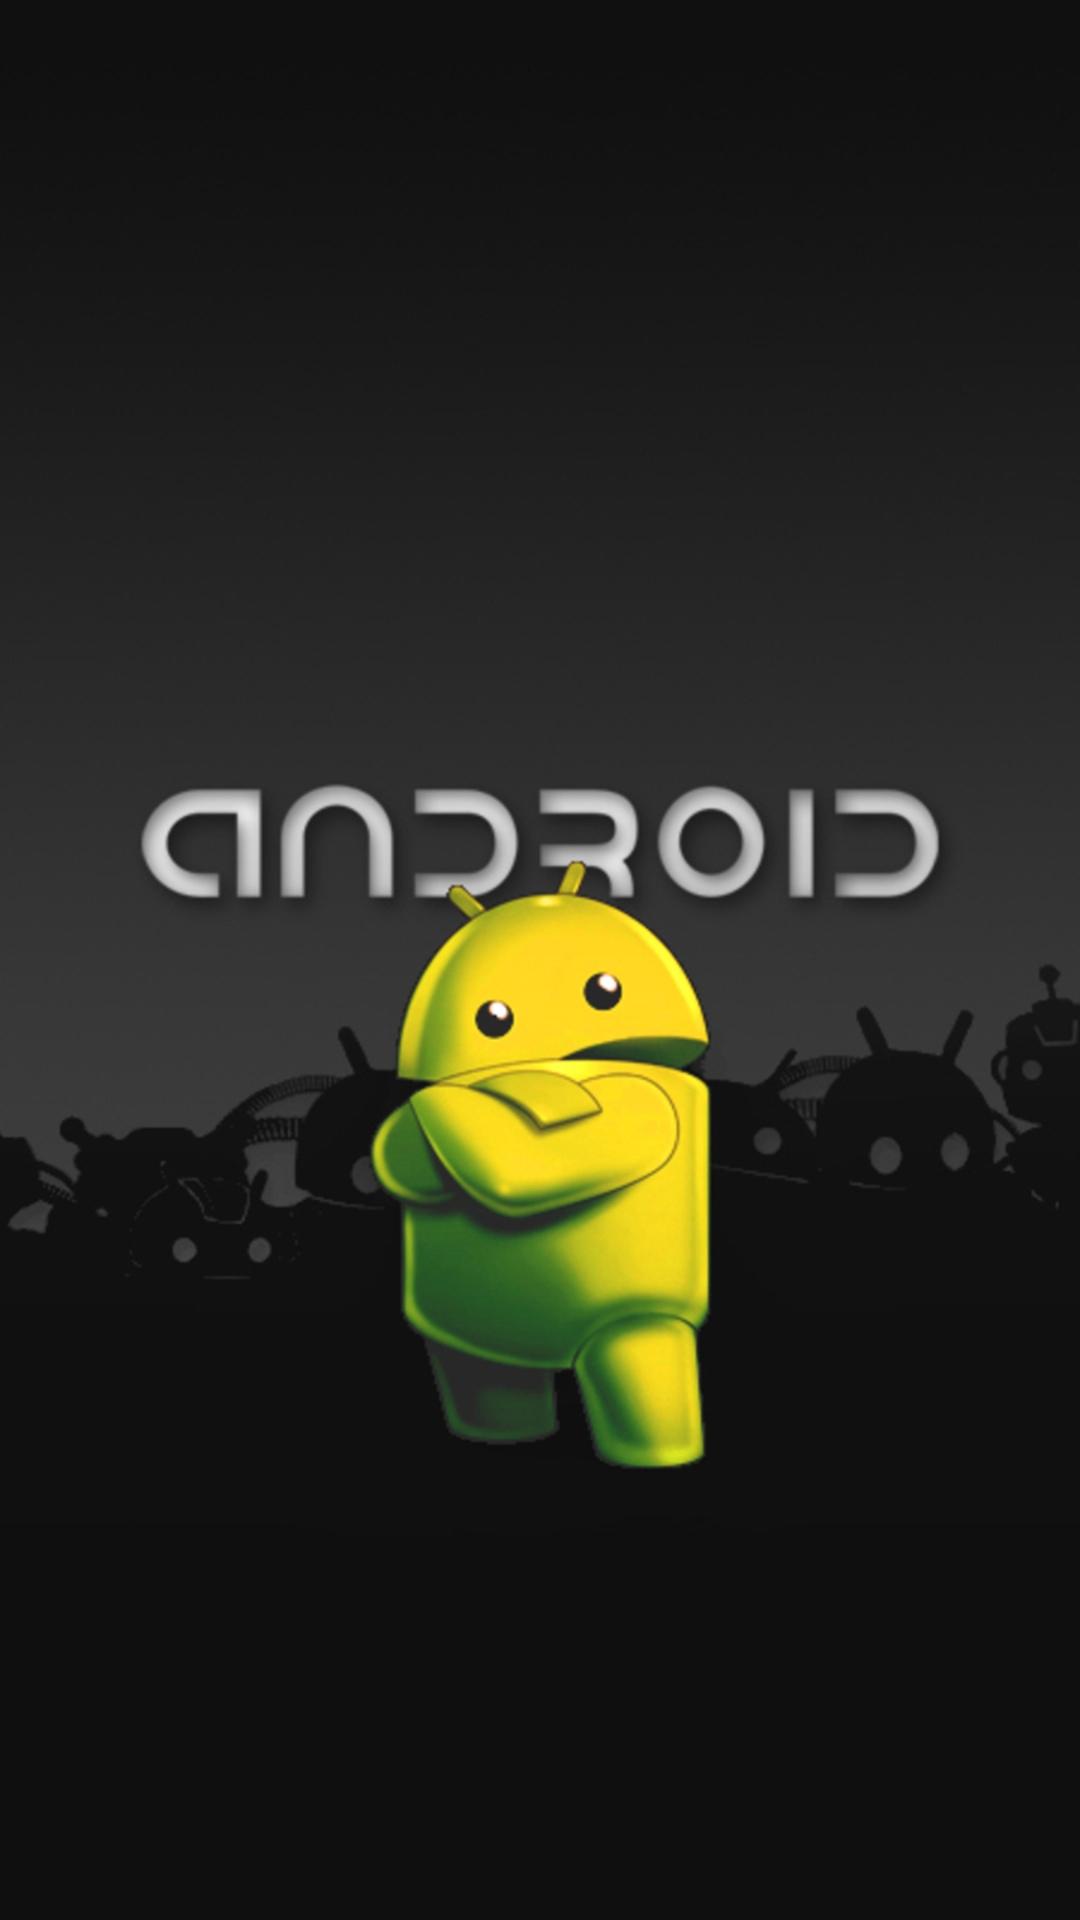 Free Download Pics Photos Android Logo Wallpaper 1080x1920